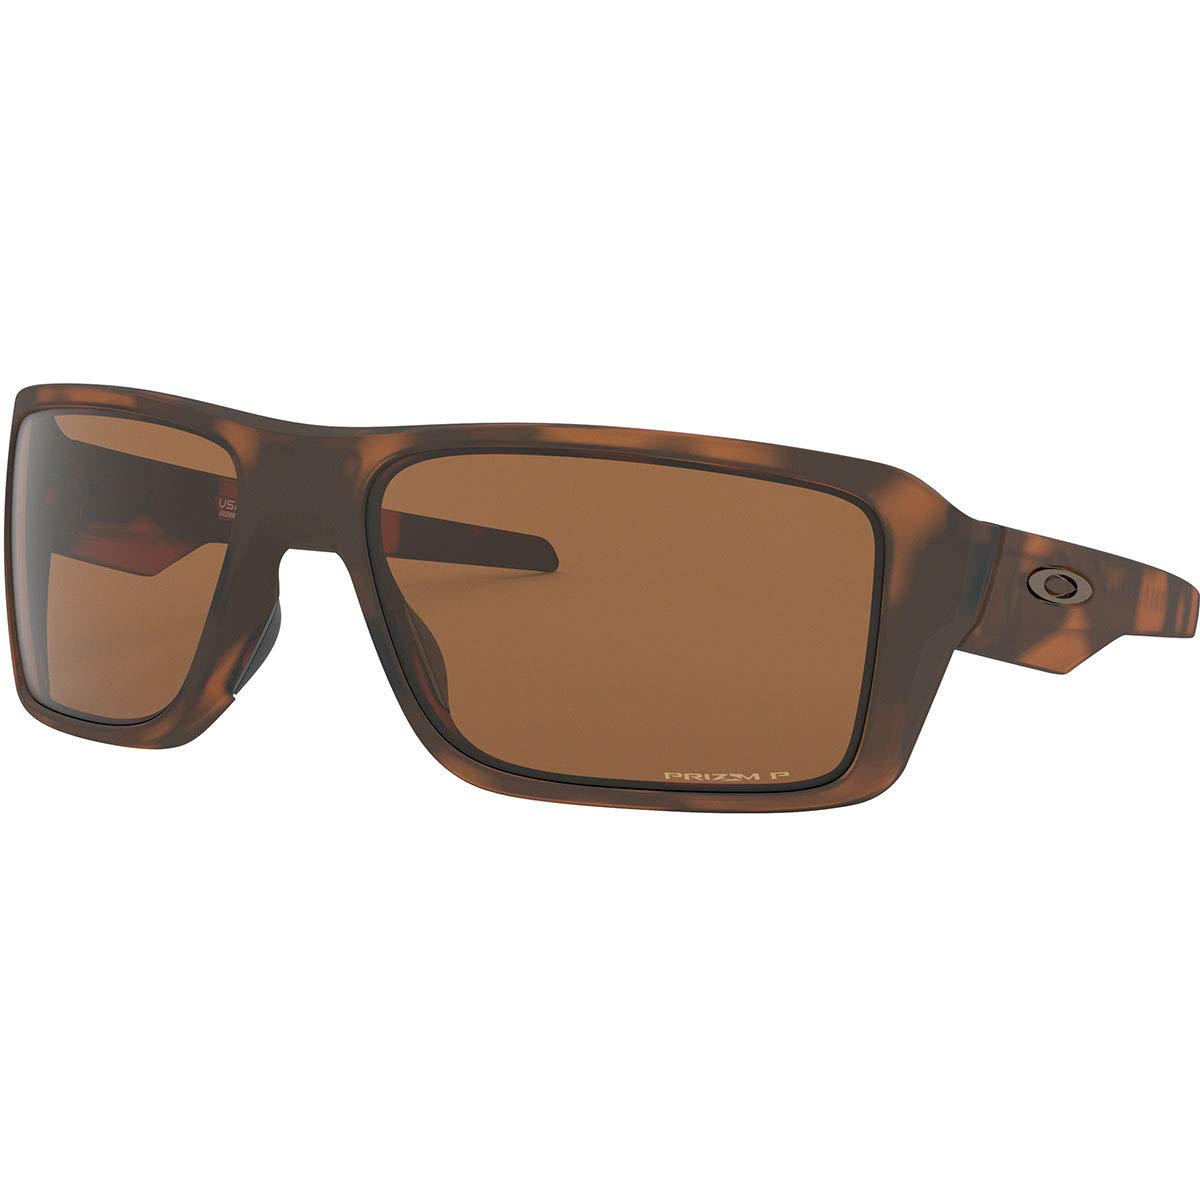 Oakley Double Edge Gafas de sol, Marrón, 66 para Hombre